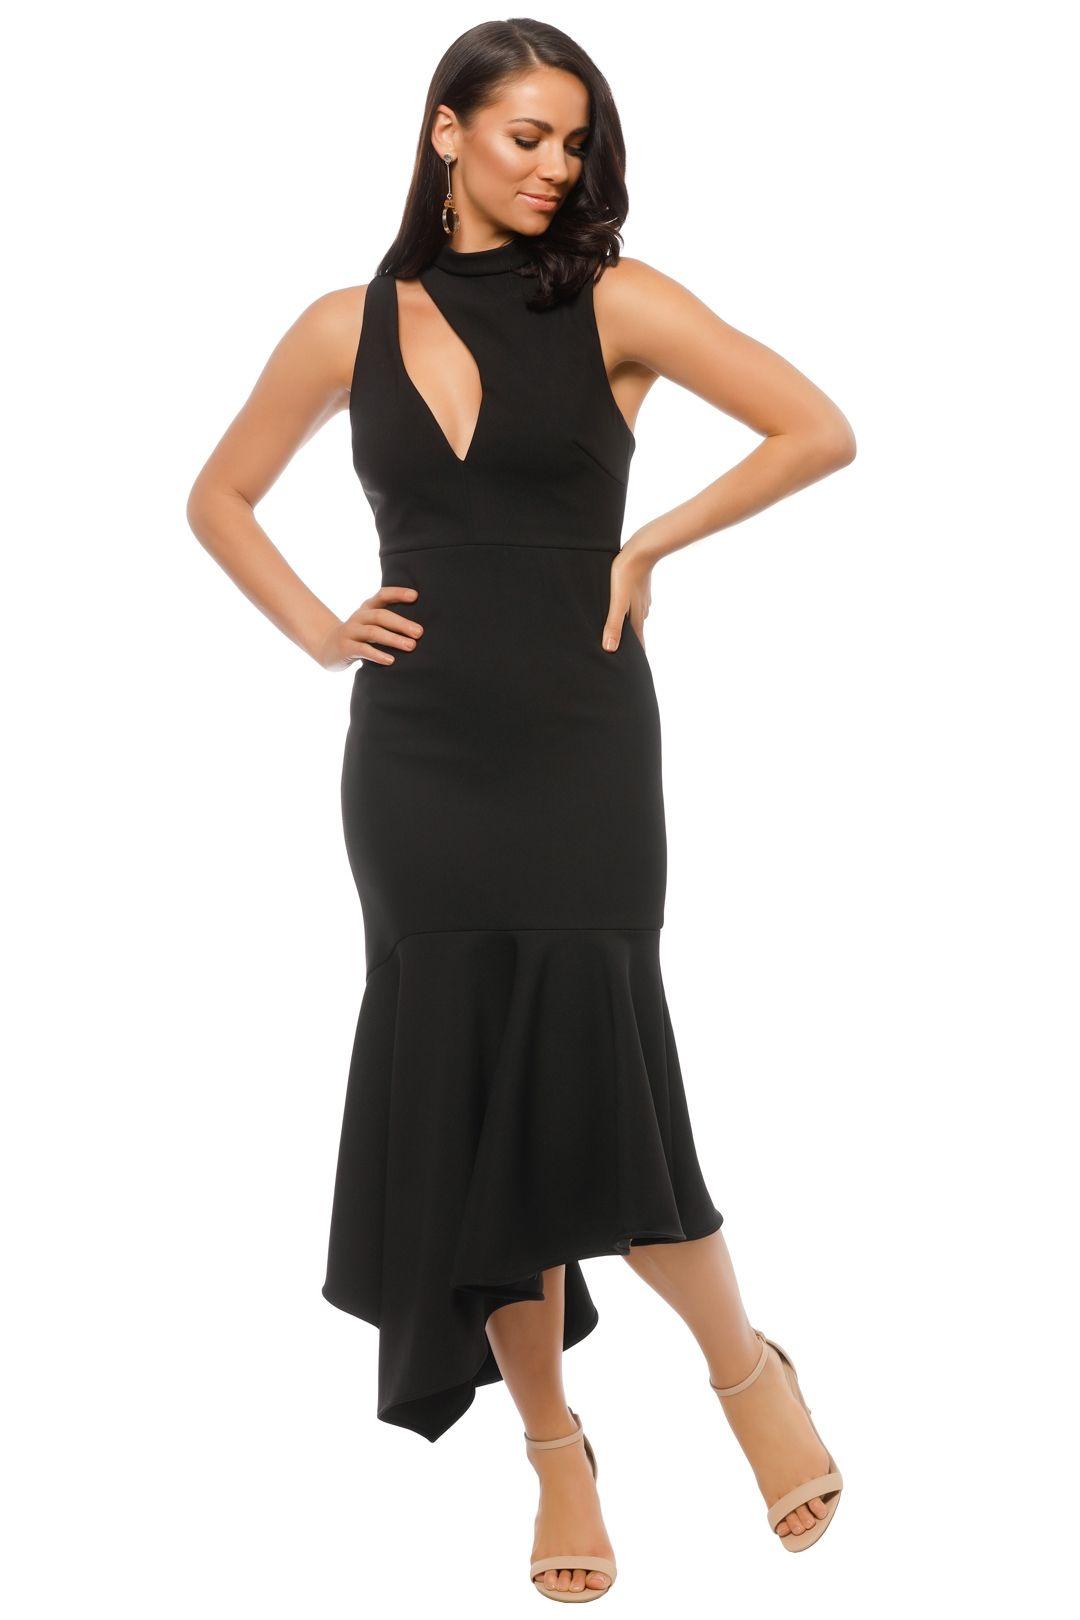 Talulah - Foundation Midi Dress - Black - Front